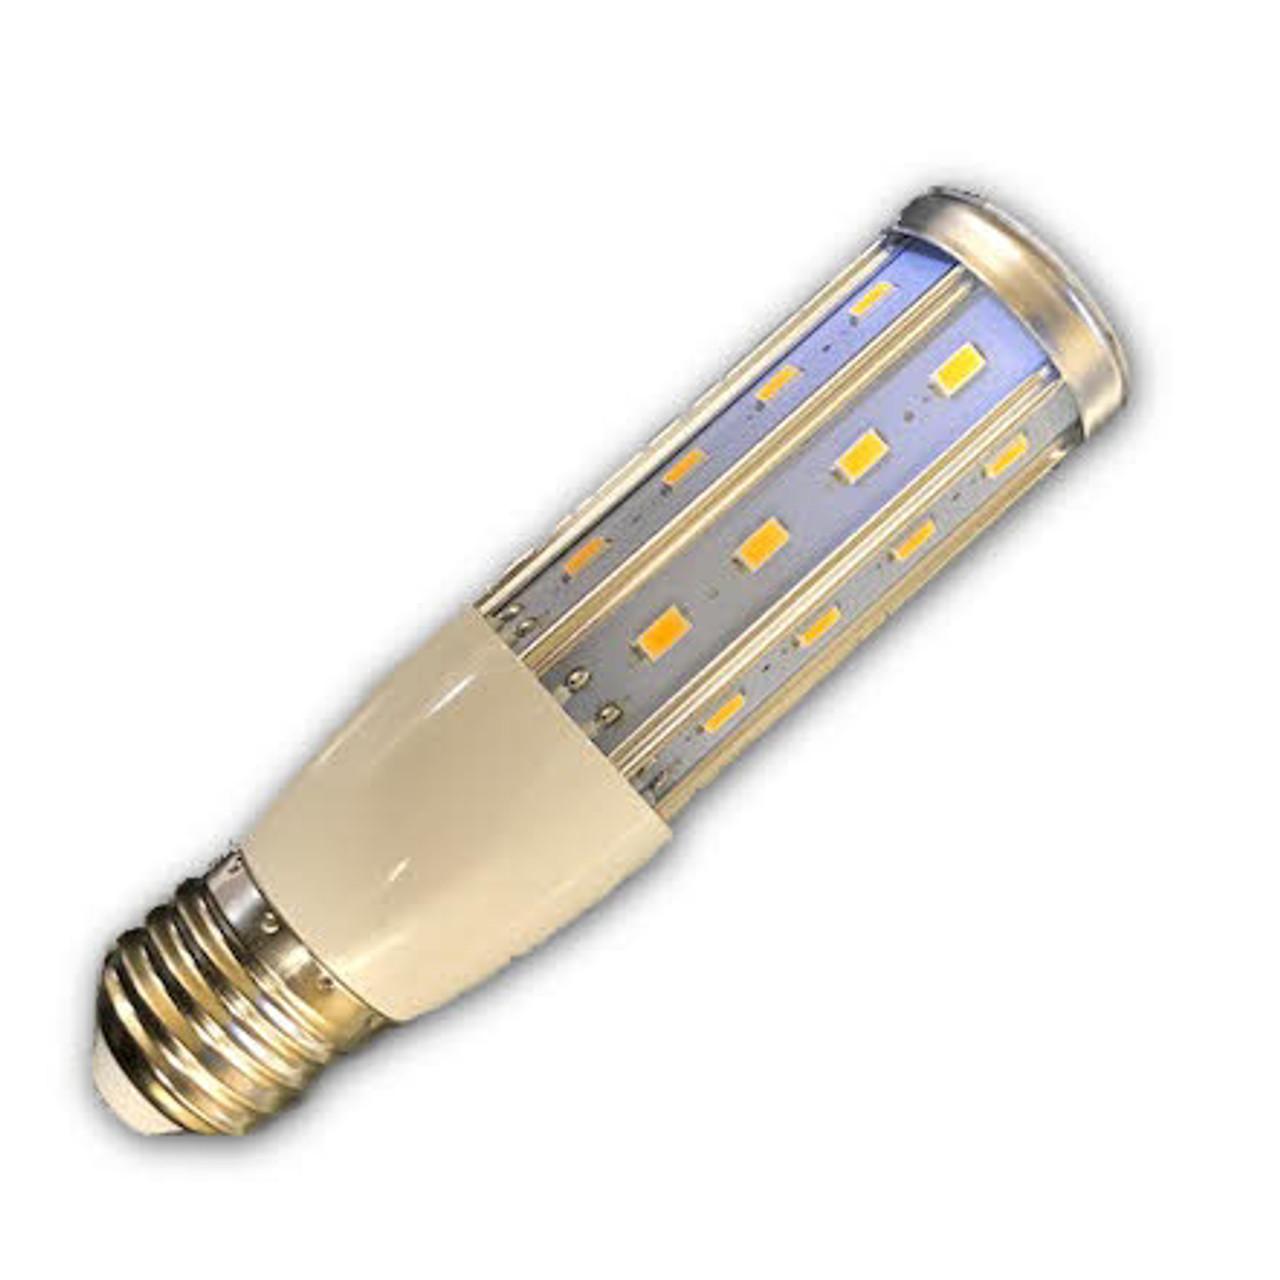 32V LED Bulb with no globe